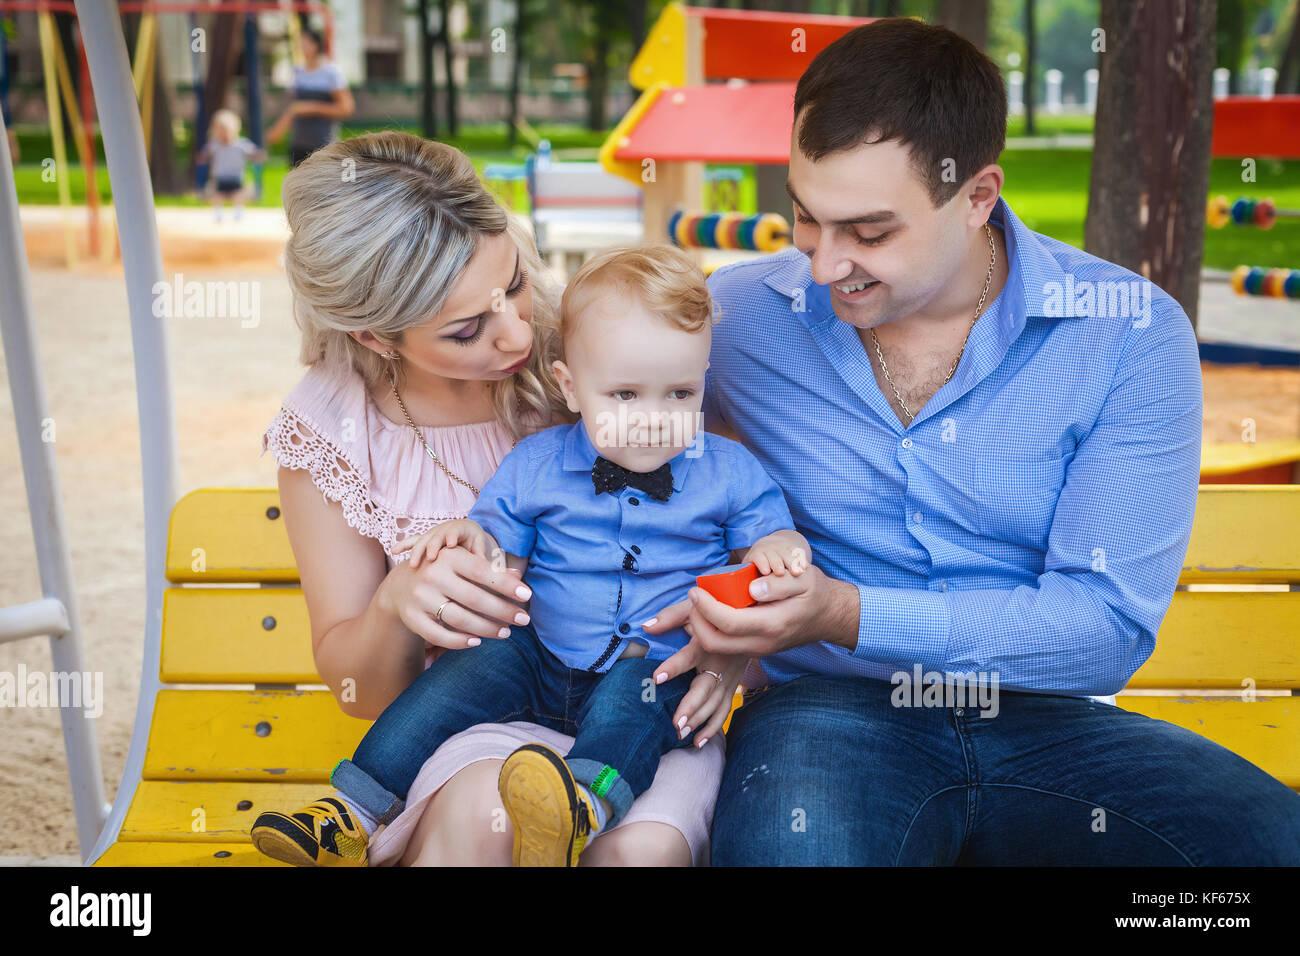 sweet family walking in park - Stock Image